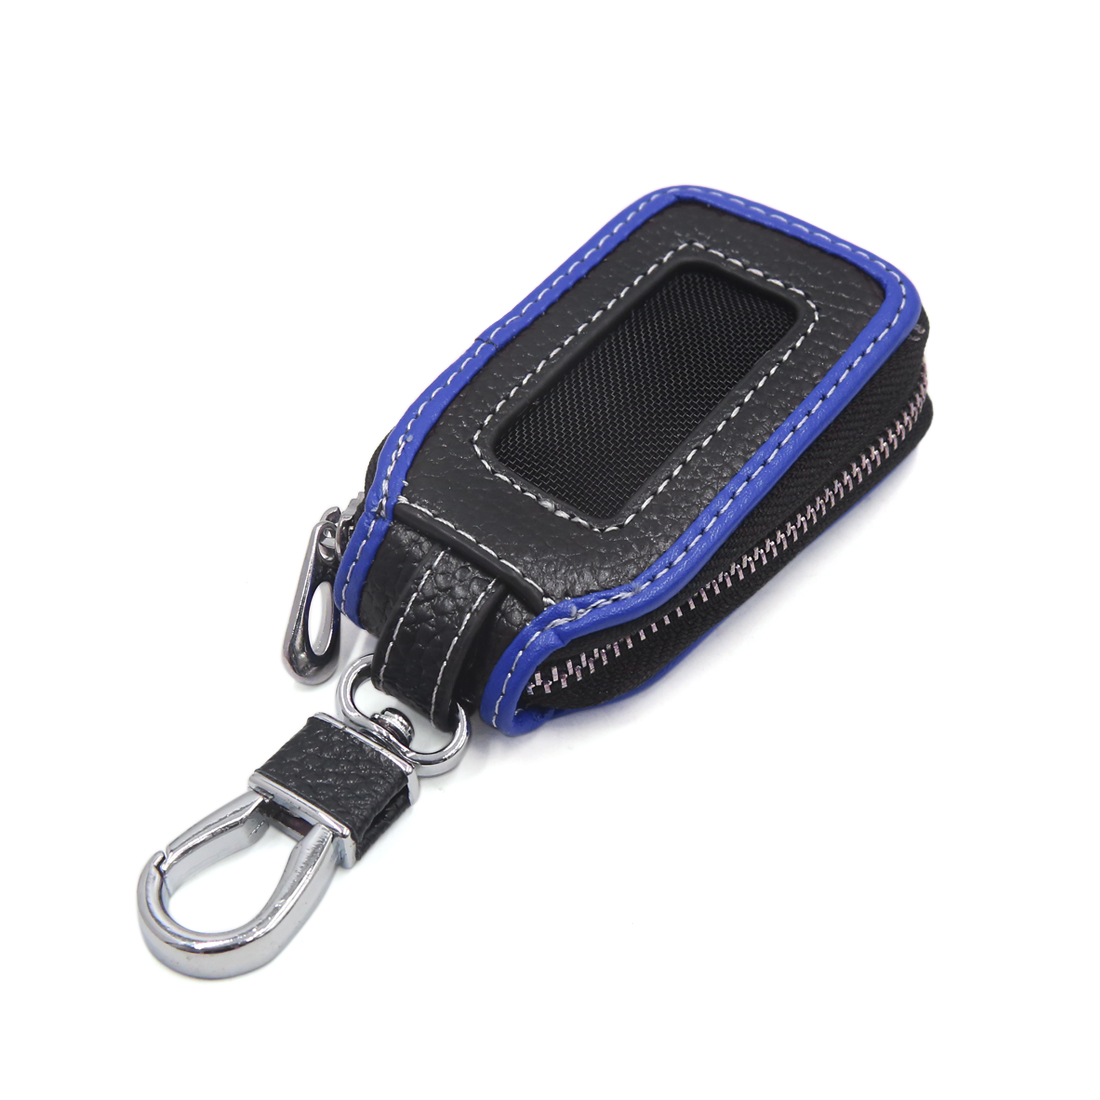 Blue Black Faux Leather Window Design Key Coin Storage Holder Zipper Bag for Car